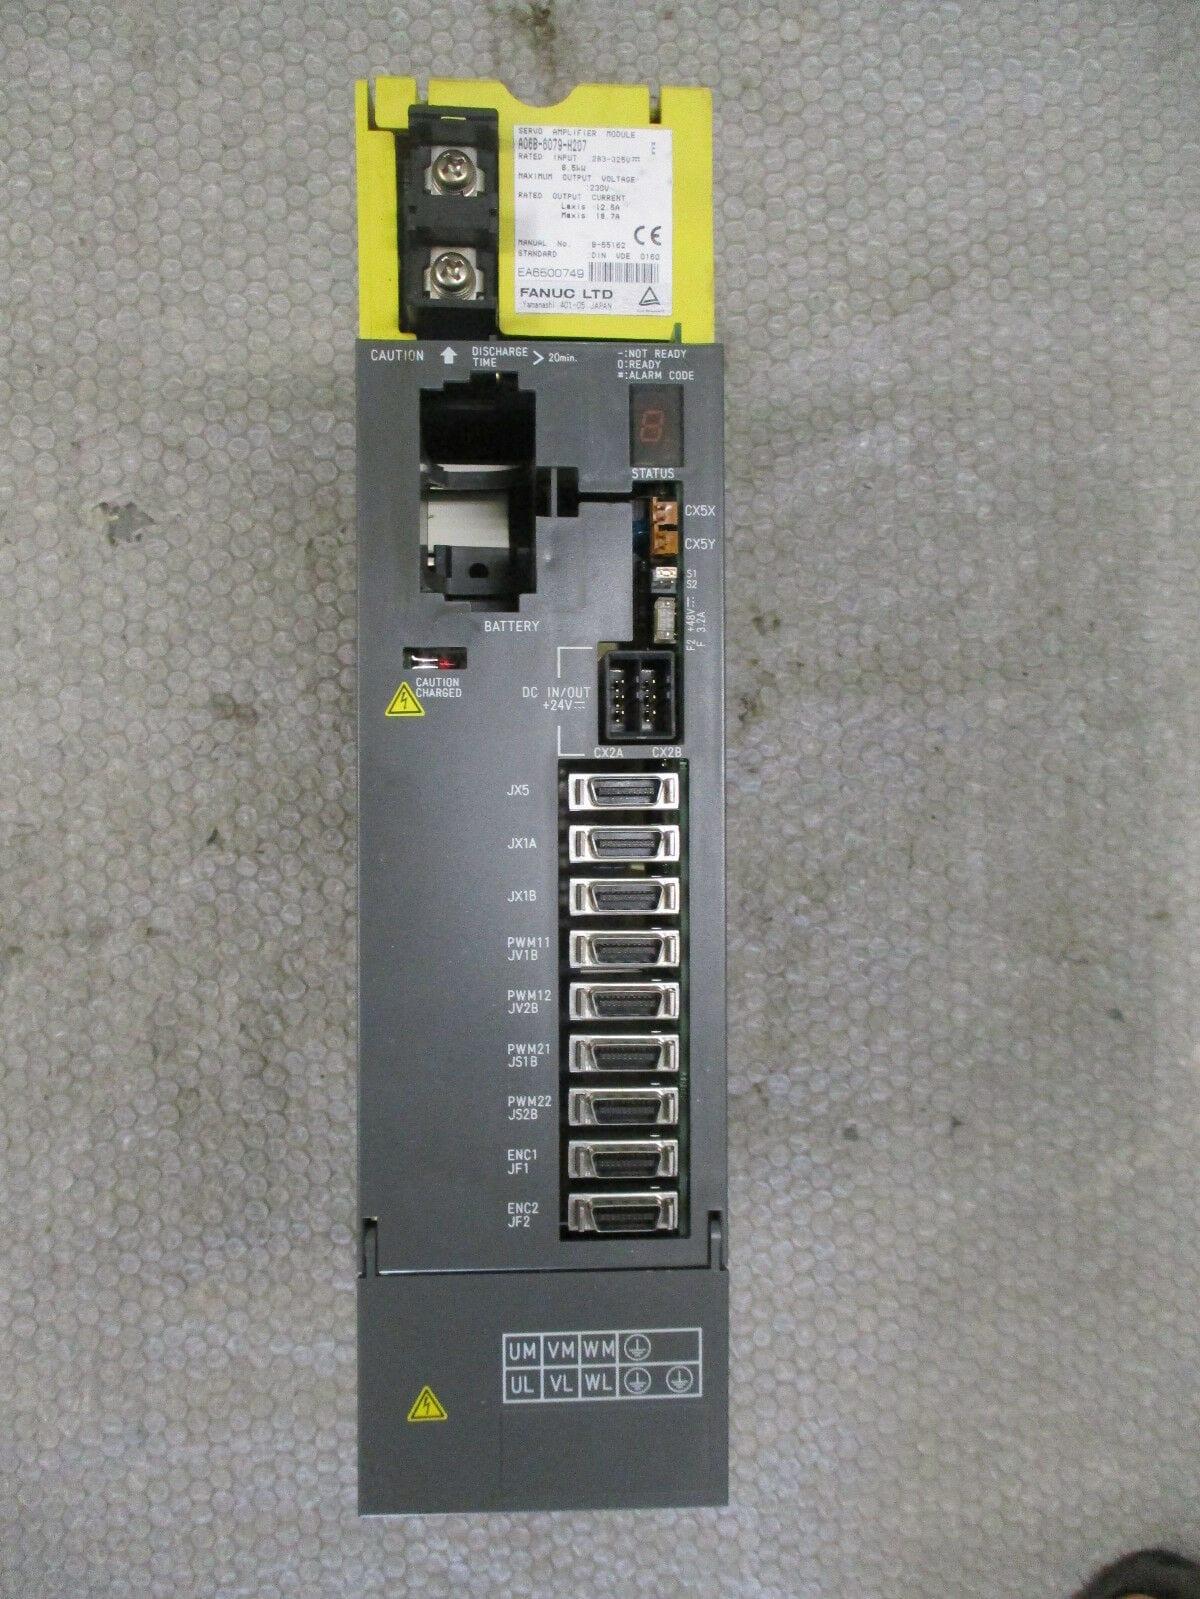 Fanuc A06B-6079-H207 Servo Amplifier module 8 5kW 230VAC Ser E *Cracked  Cover*